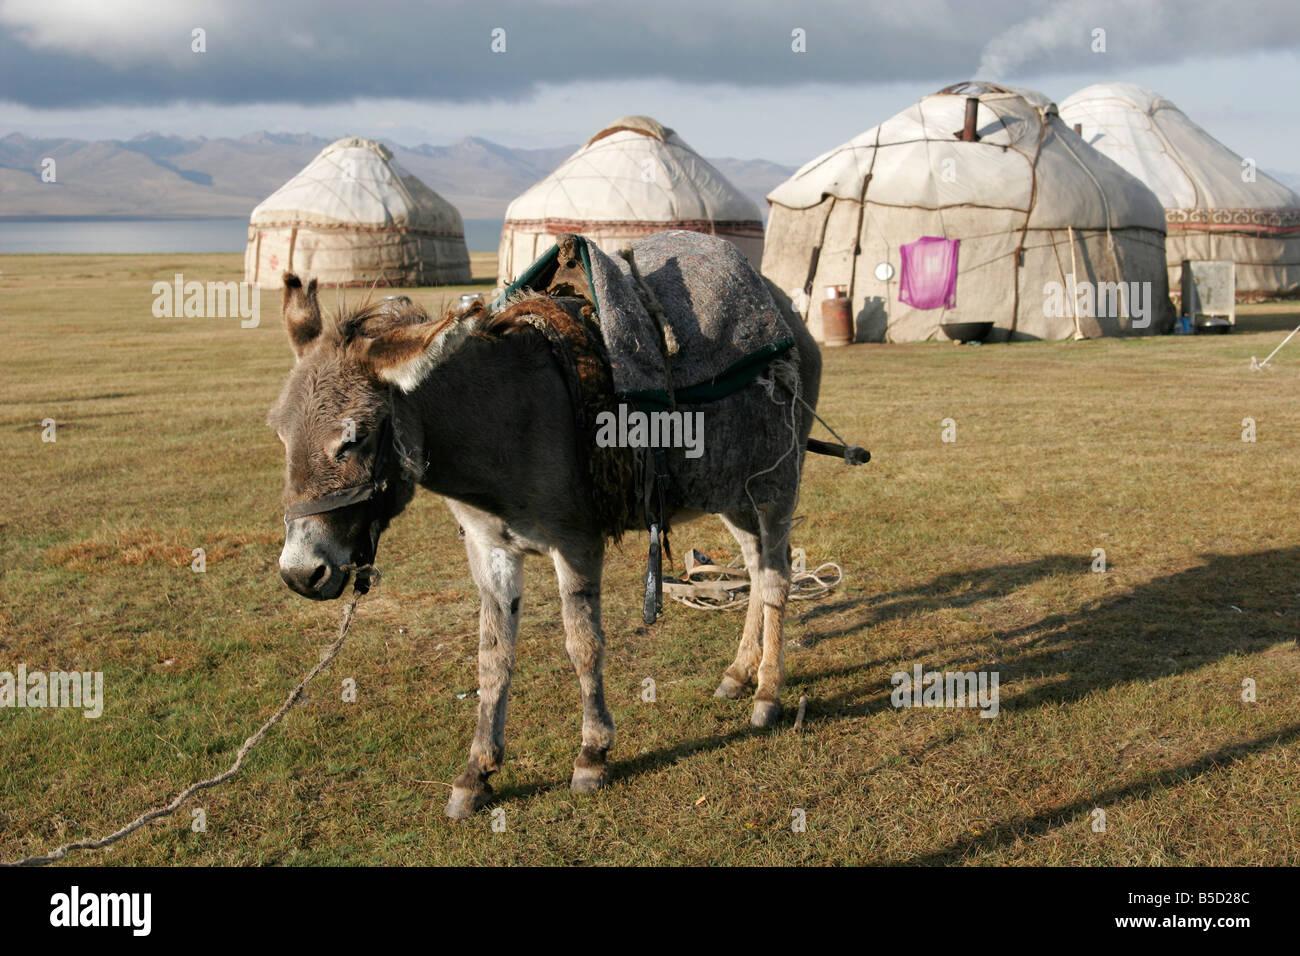 Kyrgyz yurts, lake Song-Kol, Tien Shan mountain, Kyrgyzstan, Central Asia - Stock Image